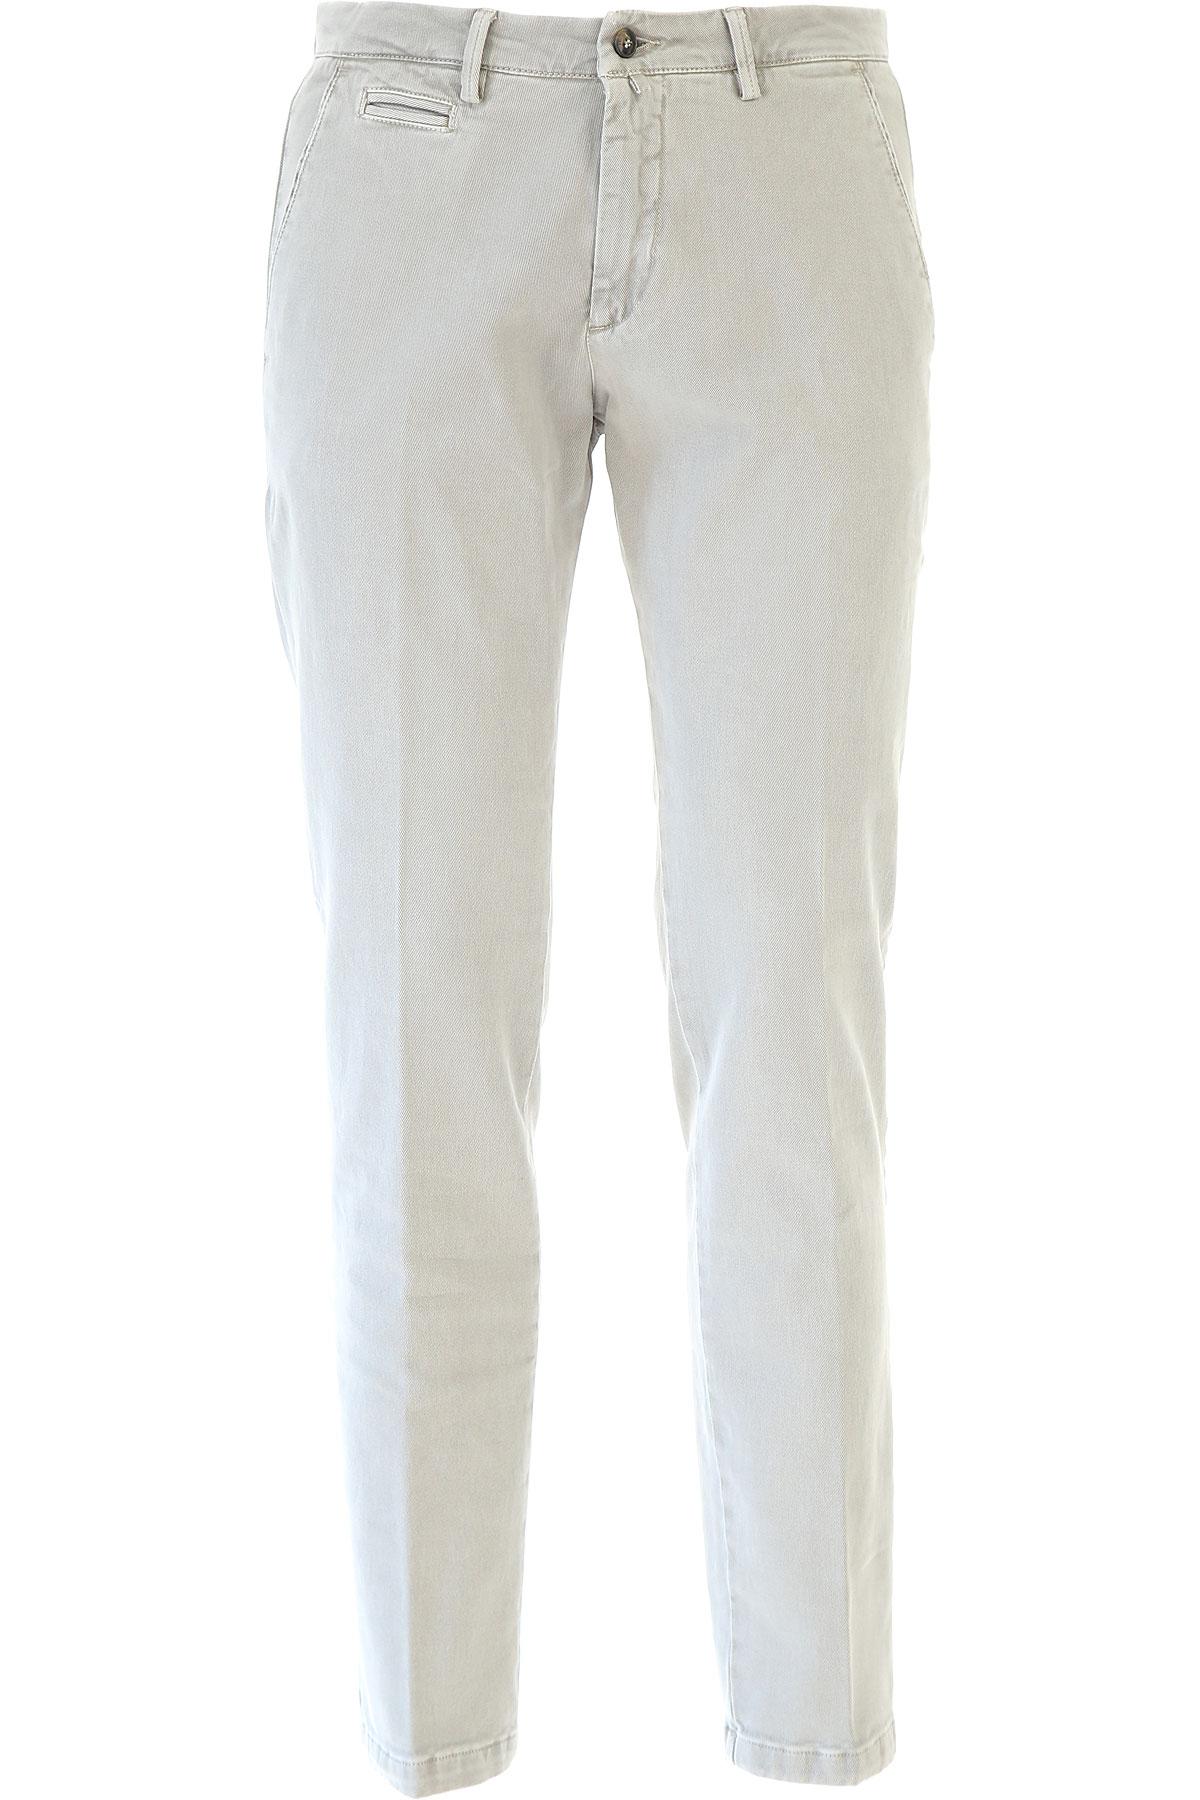 Image of Briglia Pants for Men, Beige, Cotton, 2017, US 34 - EU 48 US 36 - EU 50 US 38 - EU 52